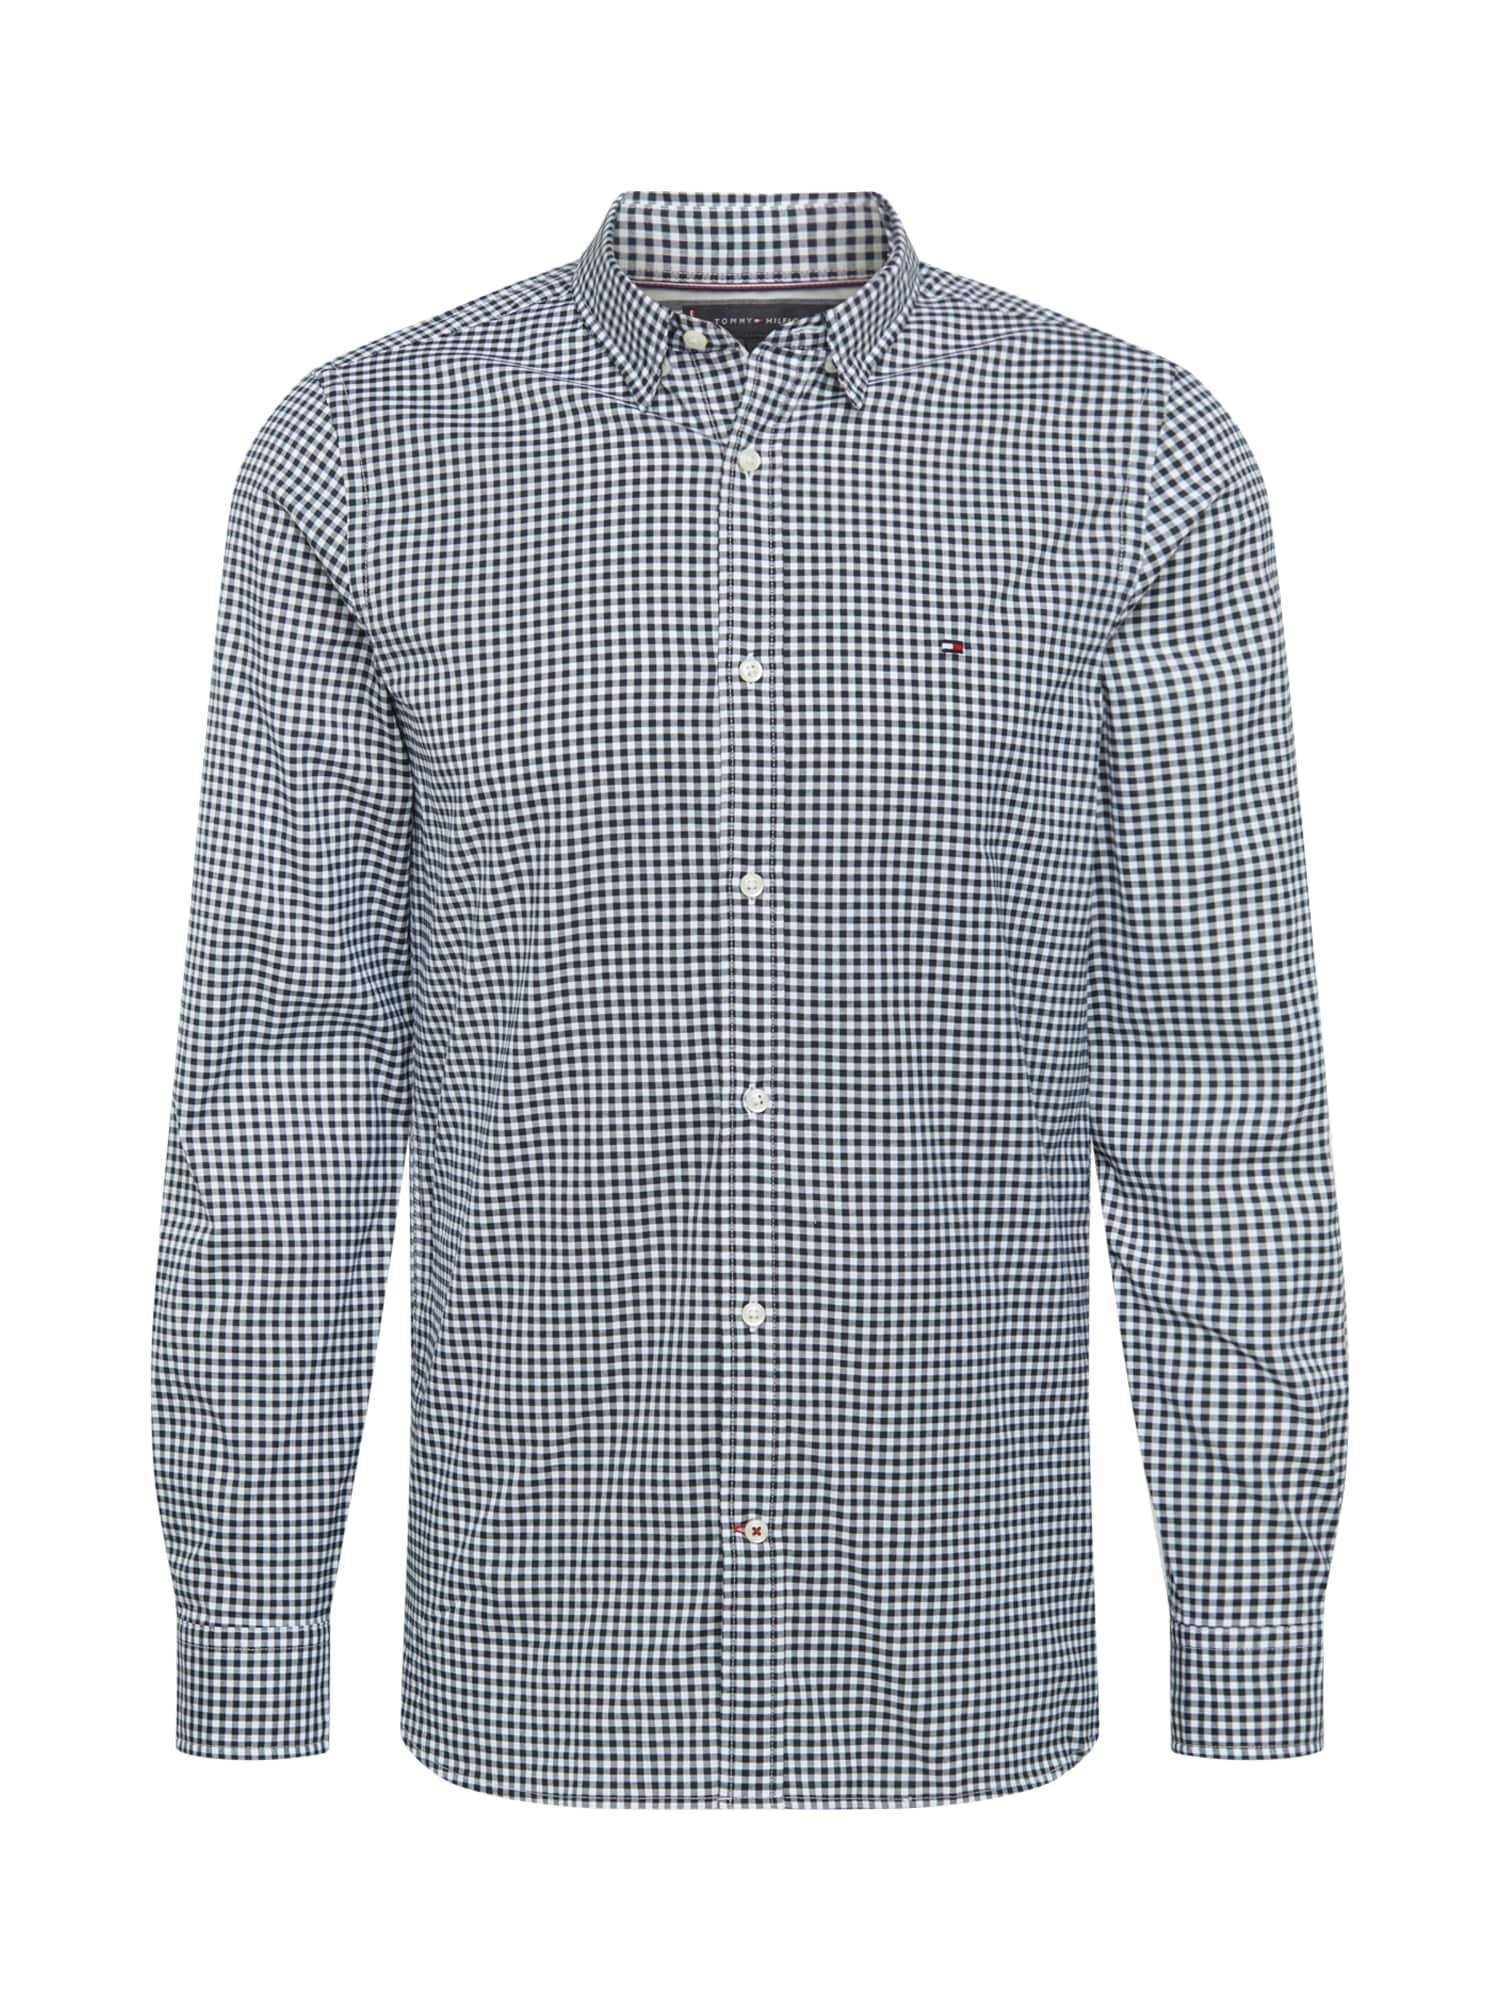 TOMMY HILFIGER Marškiniai tamsiai mėlyna / balta